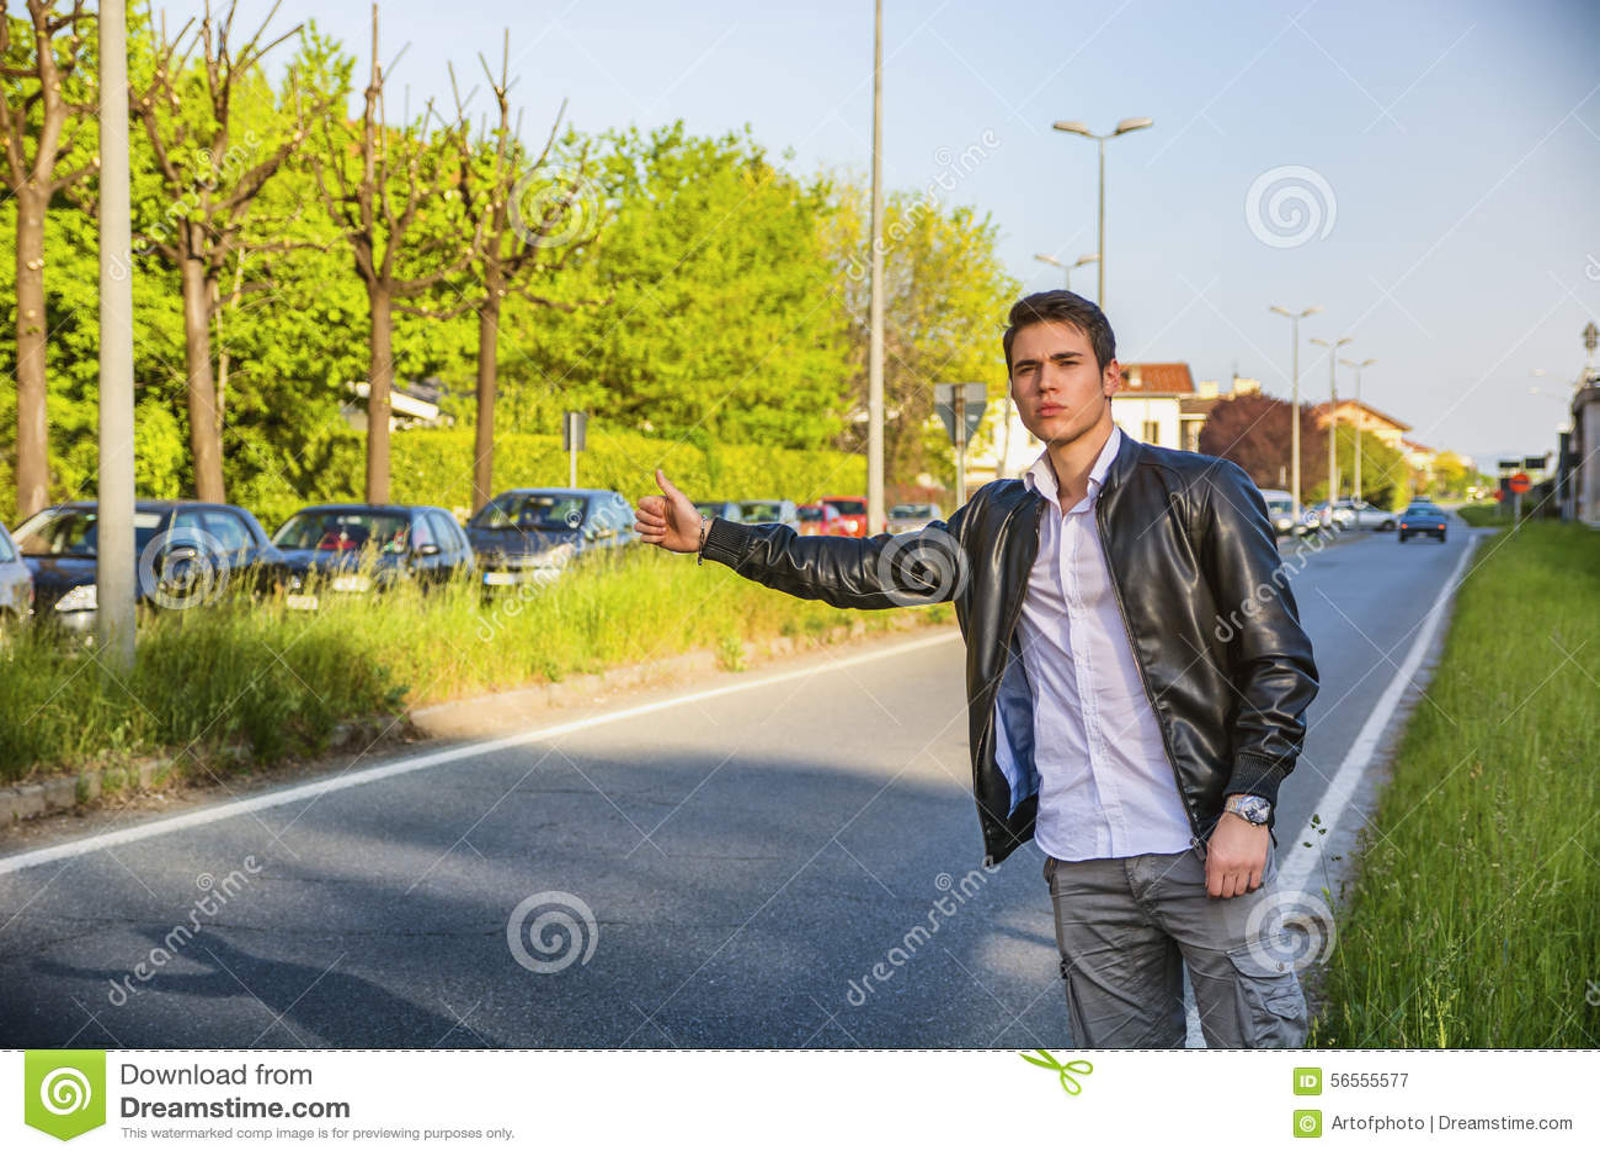 Download Όμορφος νεαρός άνδρας, Hitchhiker που περιμένει στην άκρη του δρόμου Στοκ Εικόνα - εικόνα από οδοιπόρος, πεζοπορία: 56555577